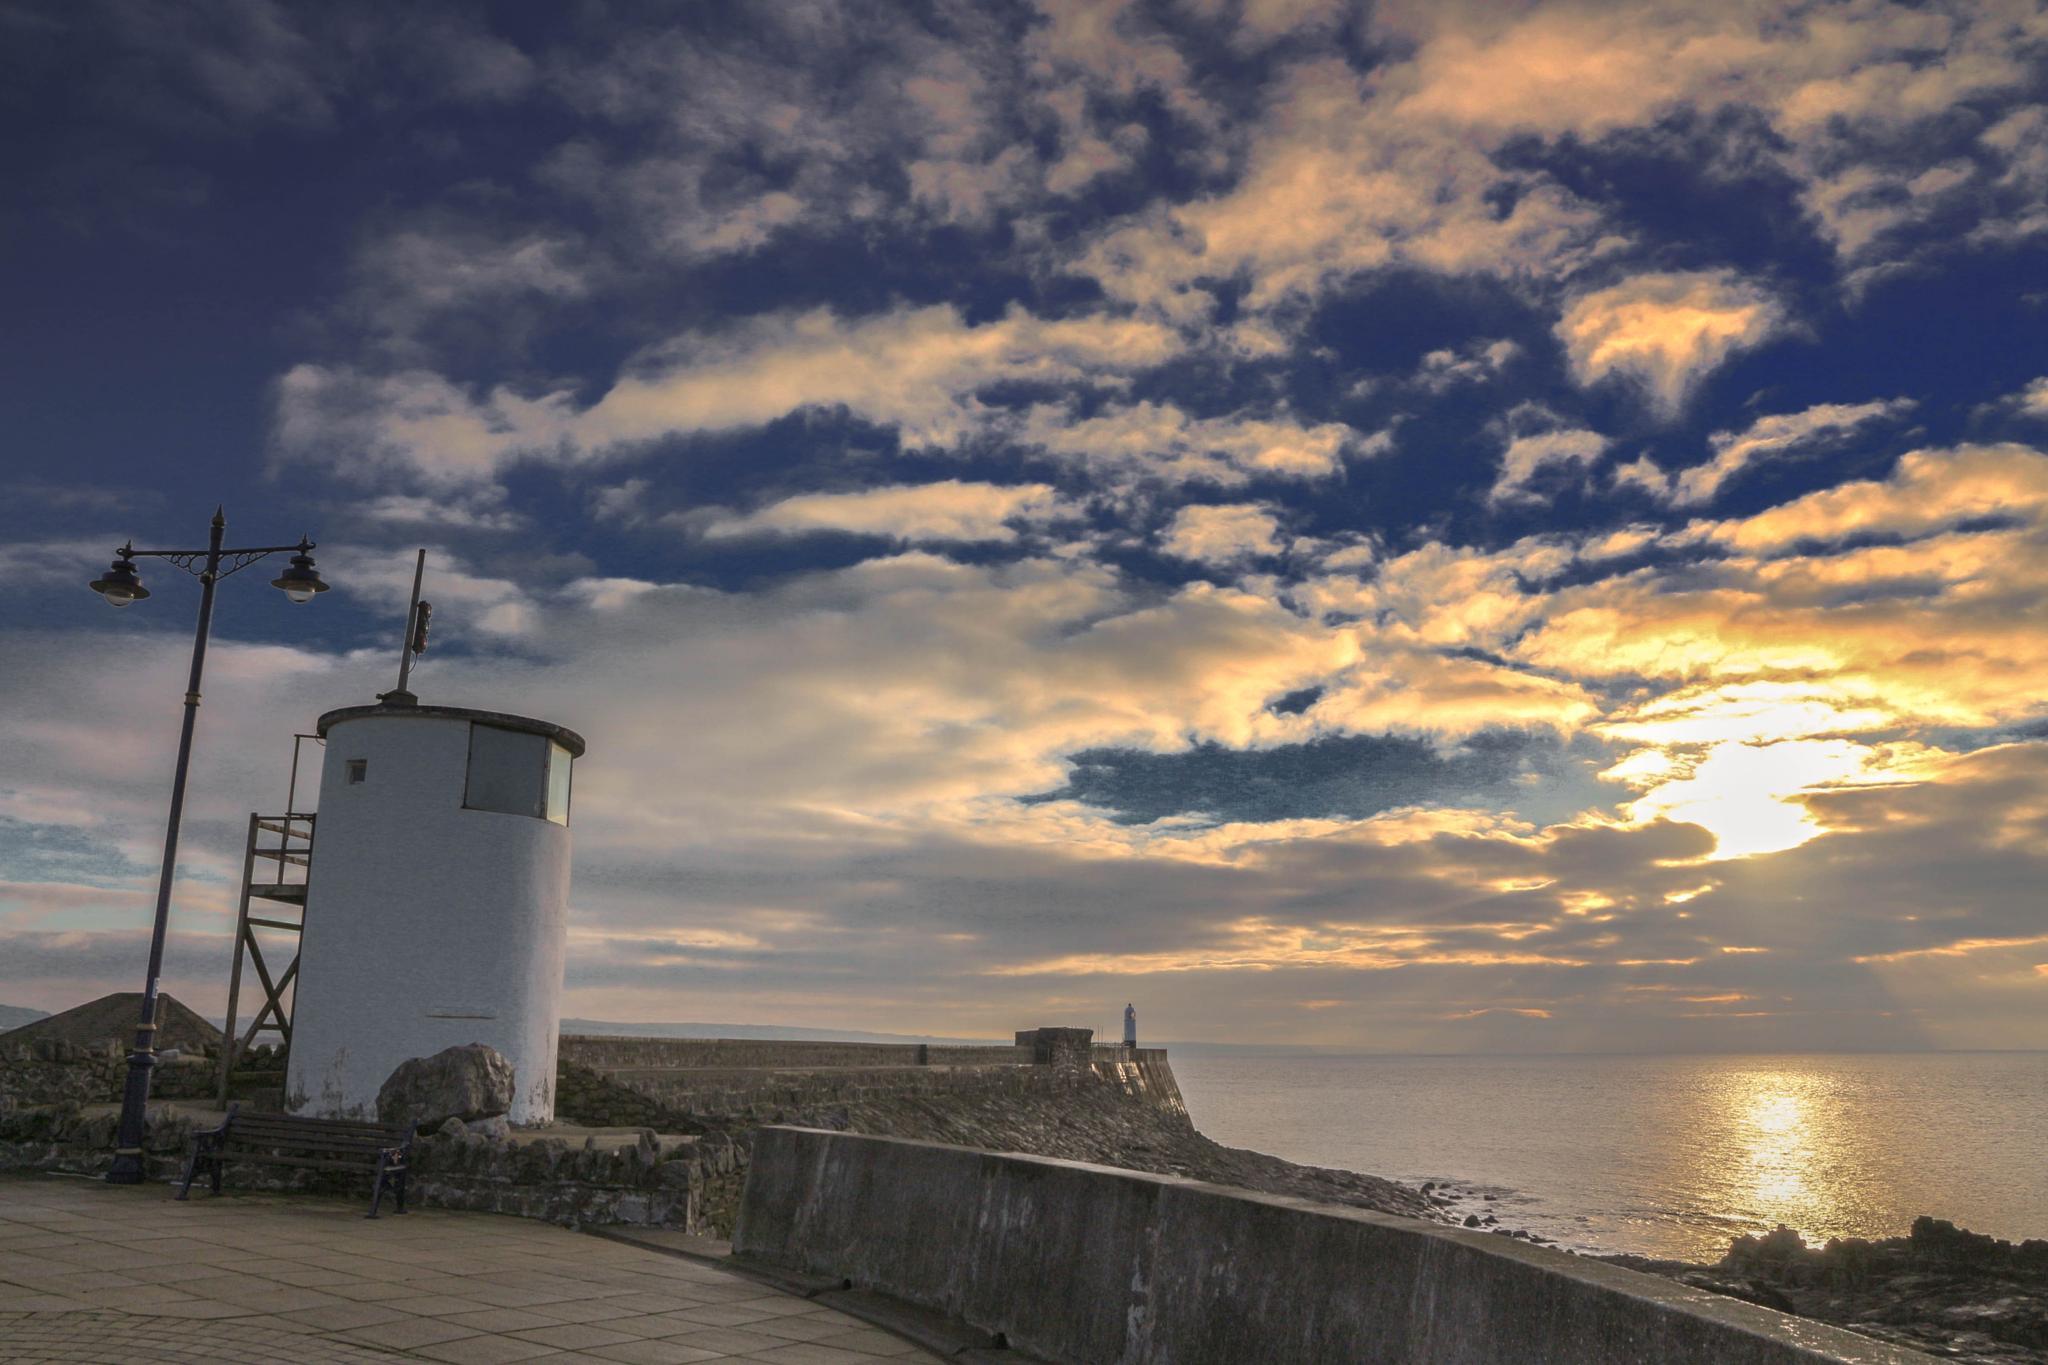 Porthcawl Coastguard, South Wales UK by Jon Franks